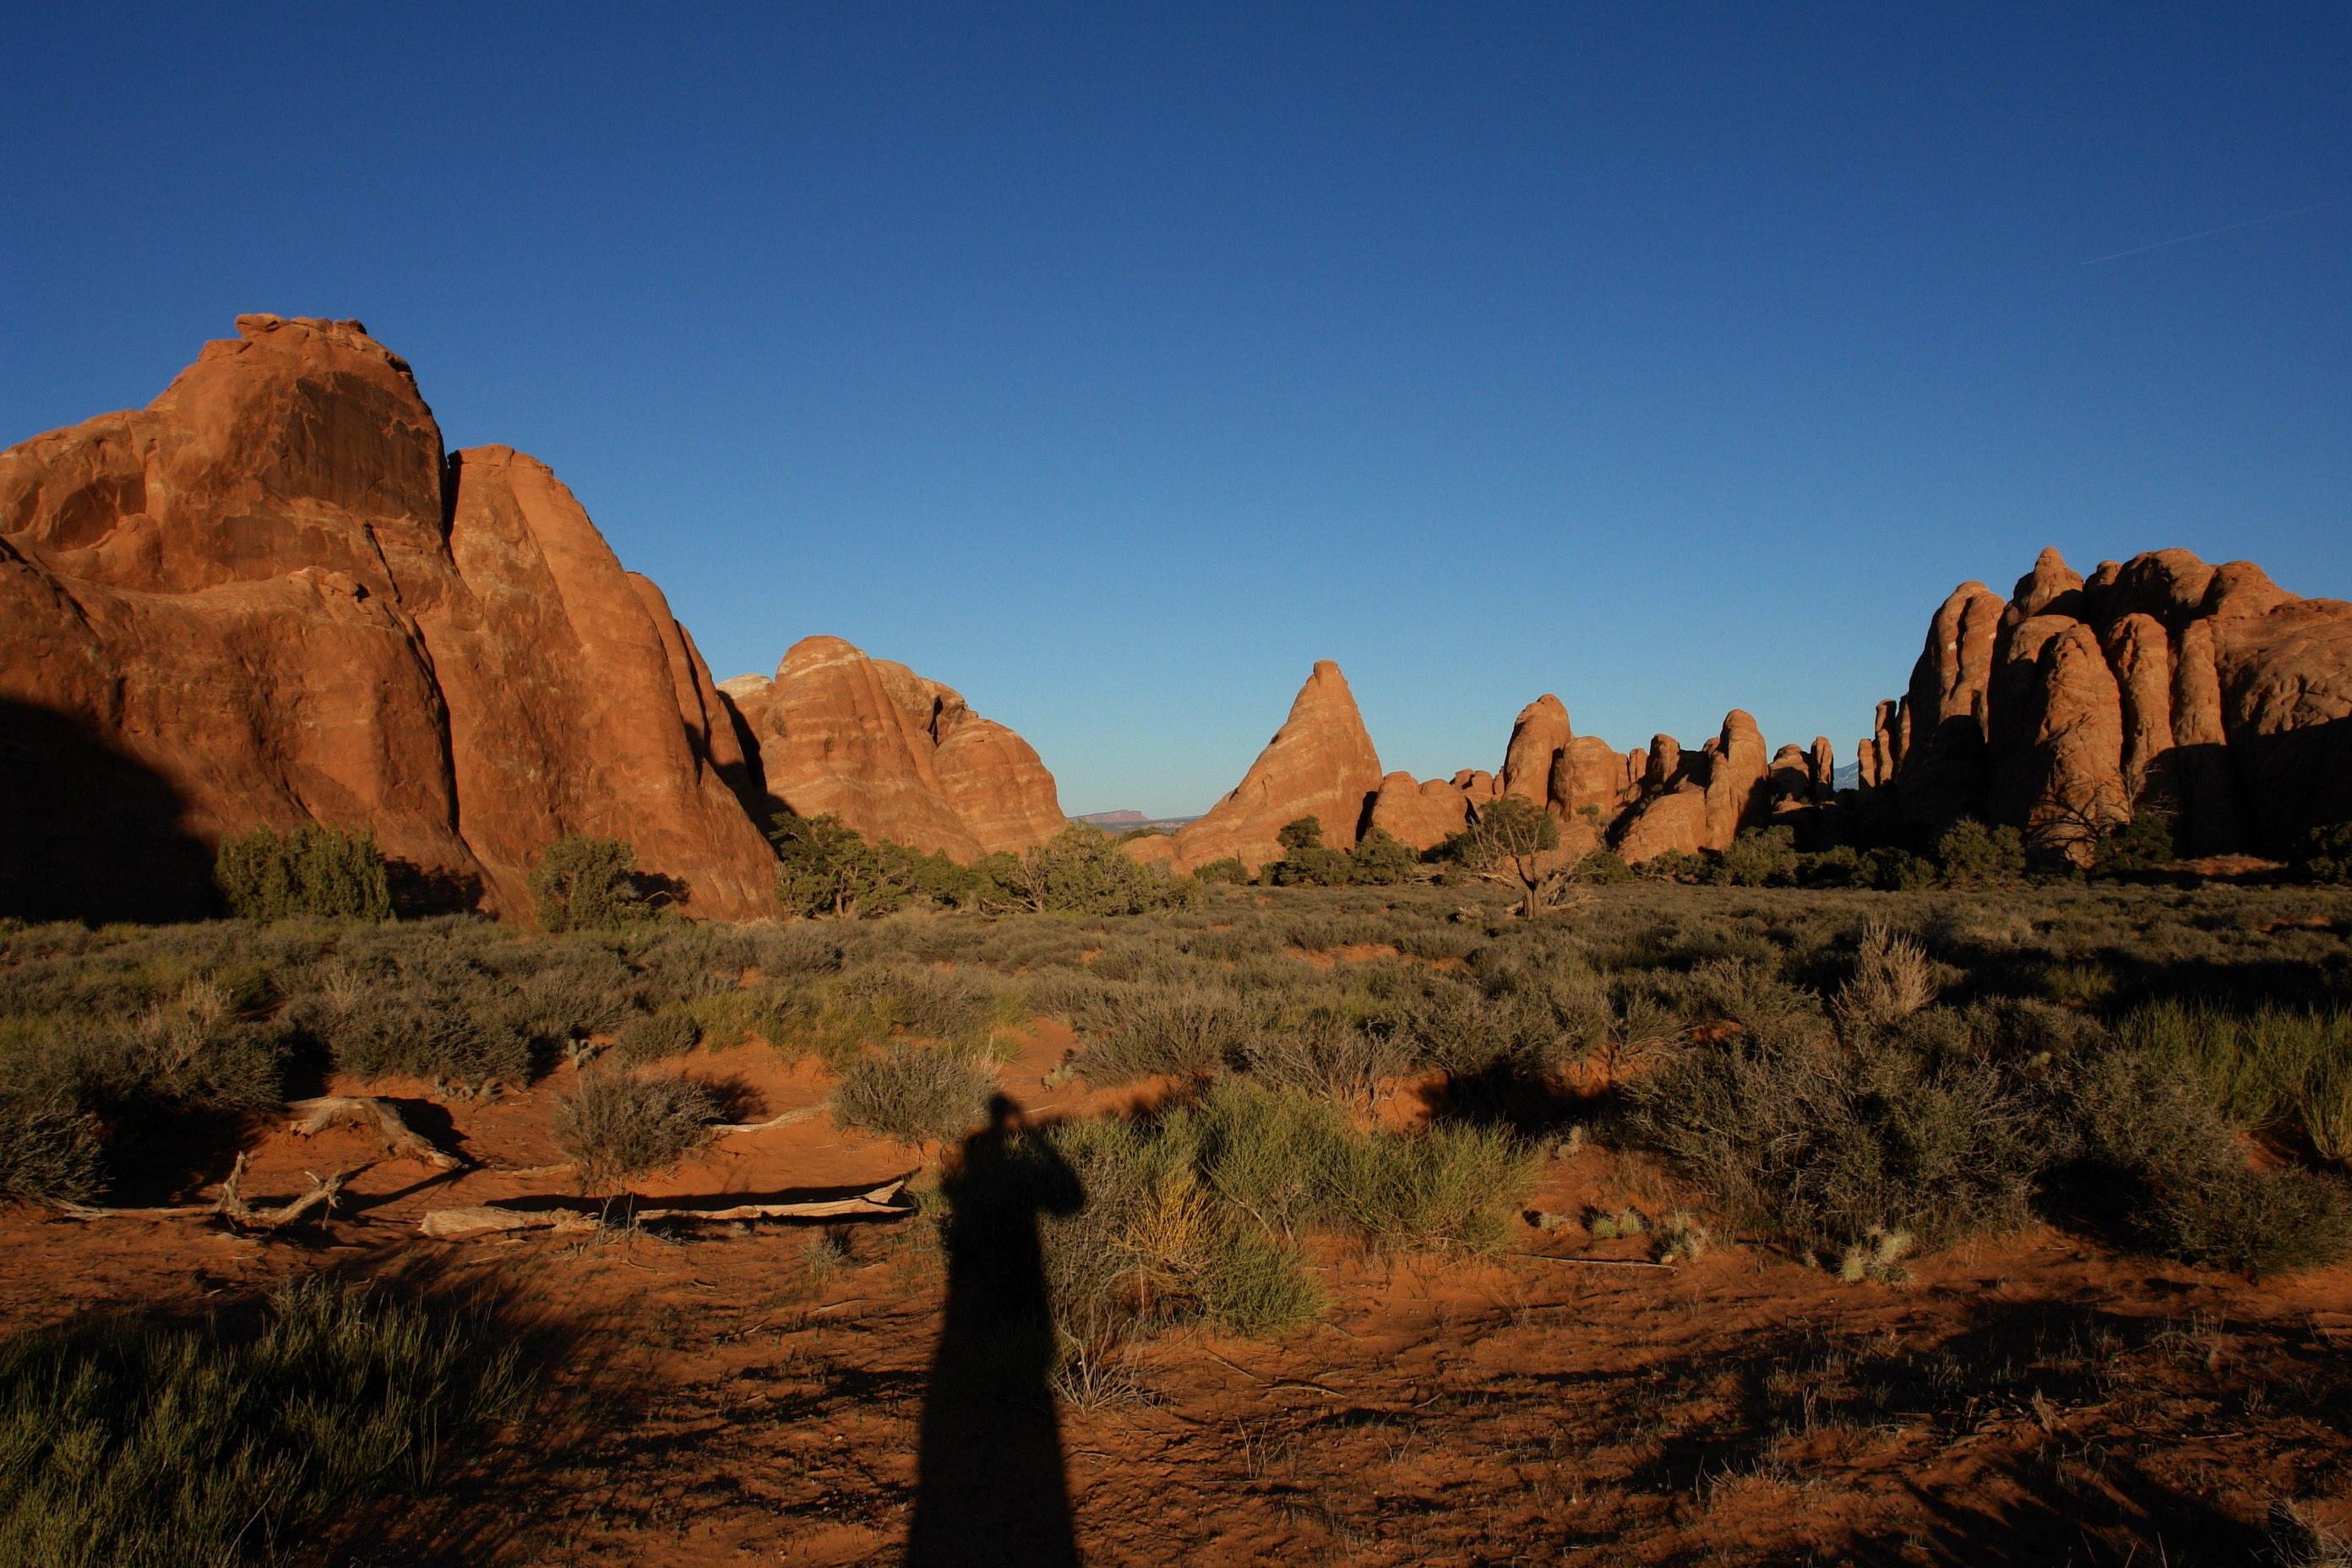 File:Arches National Park, Utah (Devils Garden Area) (3457964255 ...